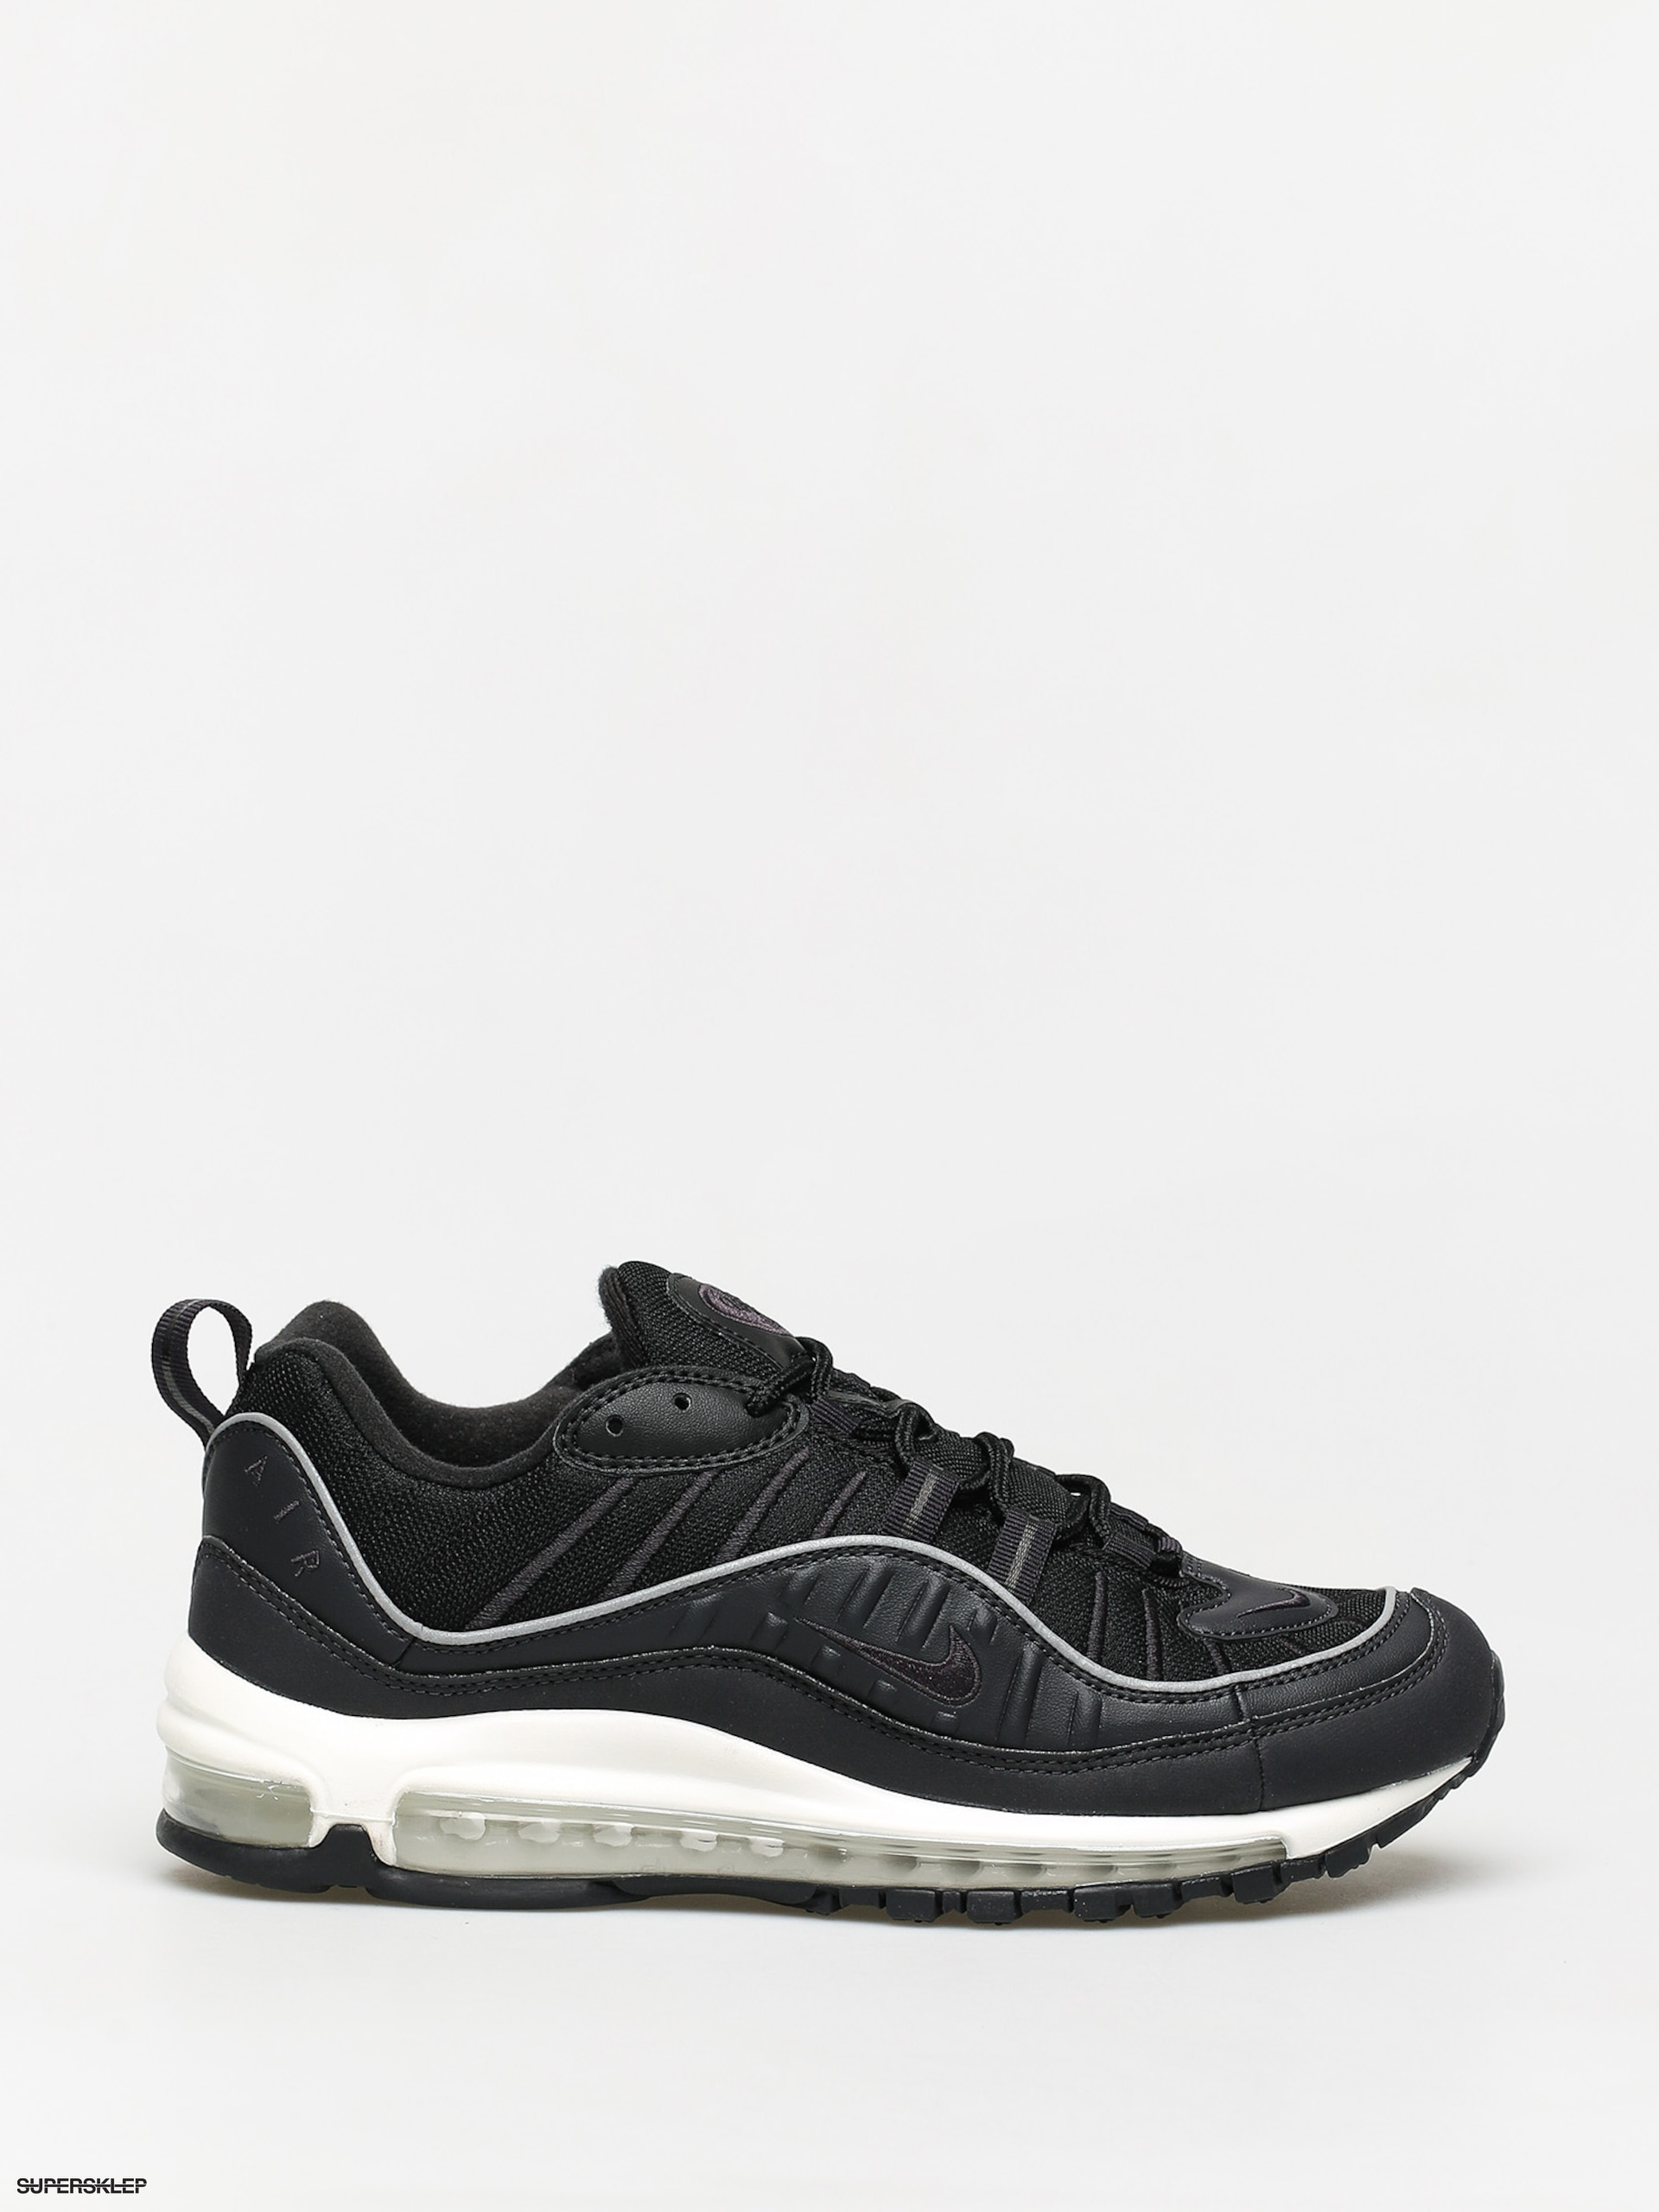 Buty Nike Air Max 98 (oil greyoil grey black summit white)